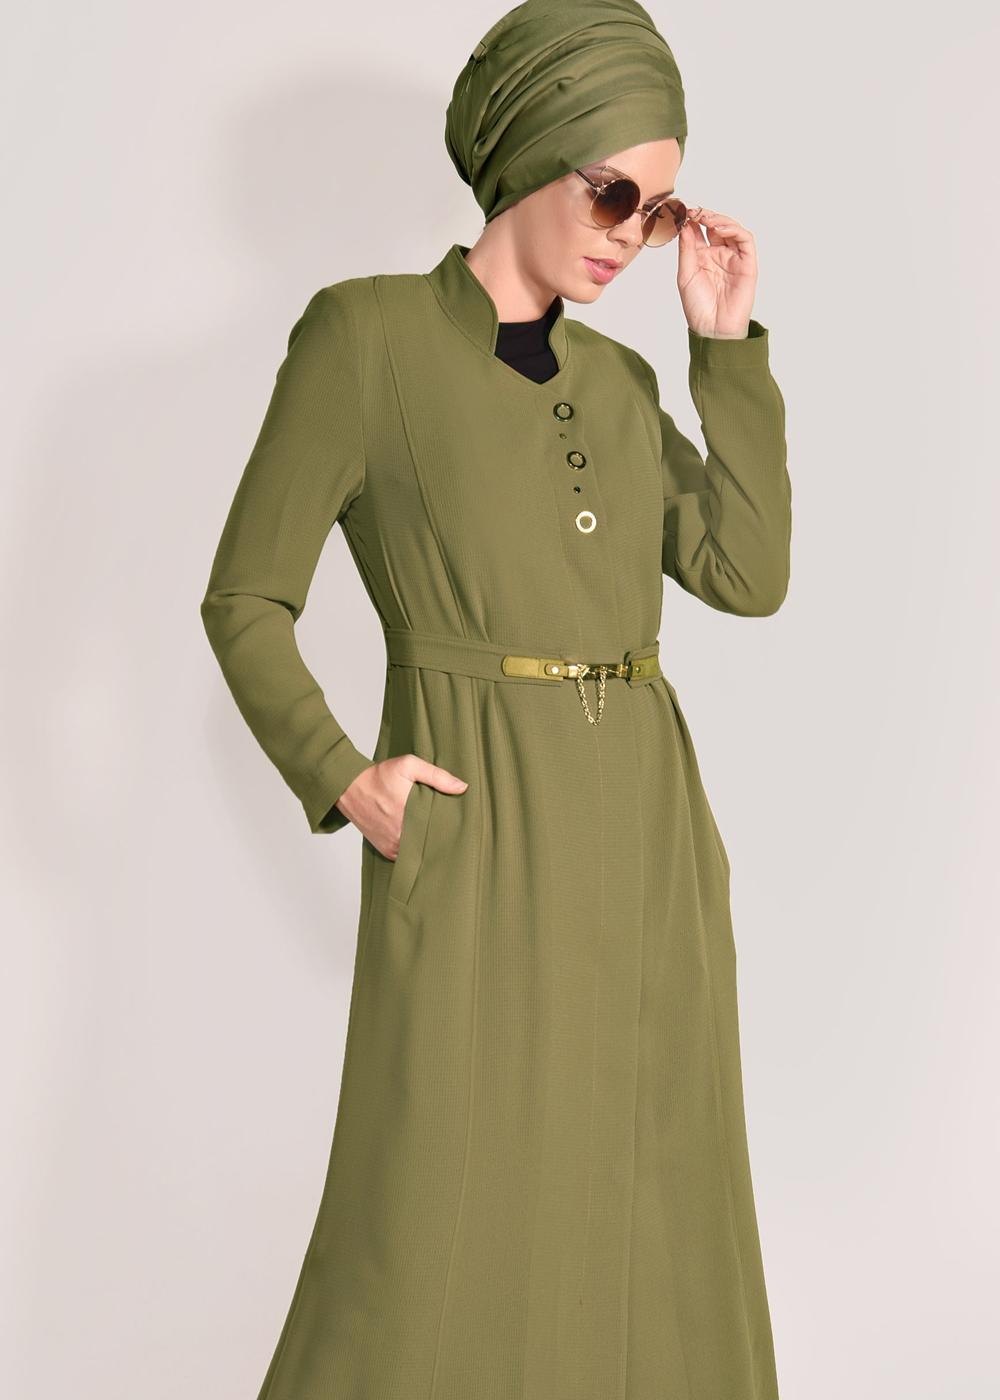 Bayan SARI T 1049 Orlando Tesettür Pardesü-Alv Fashion